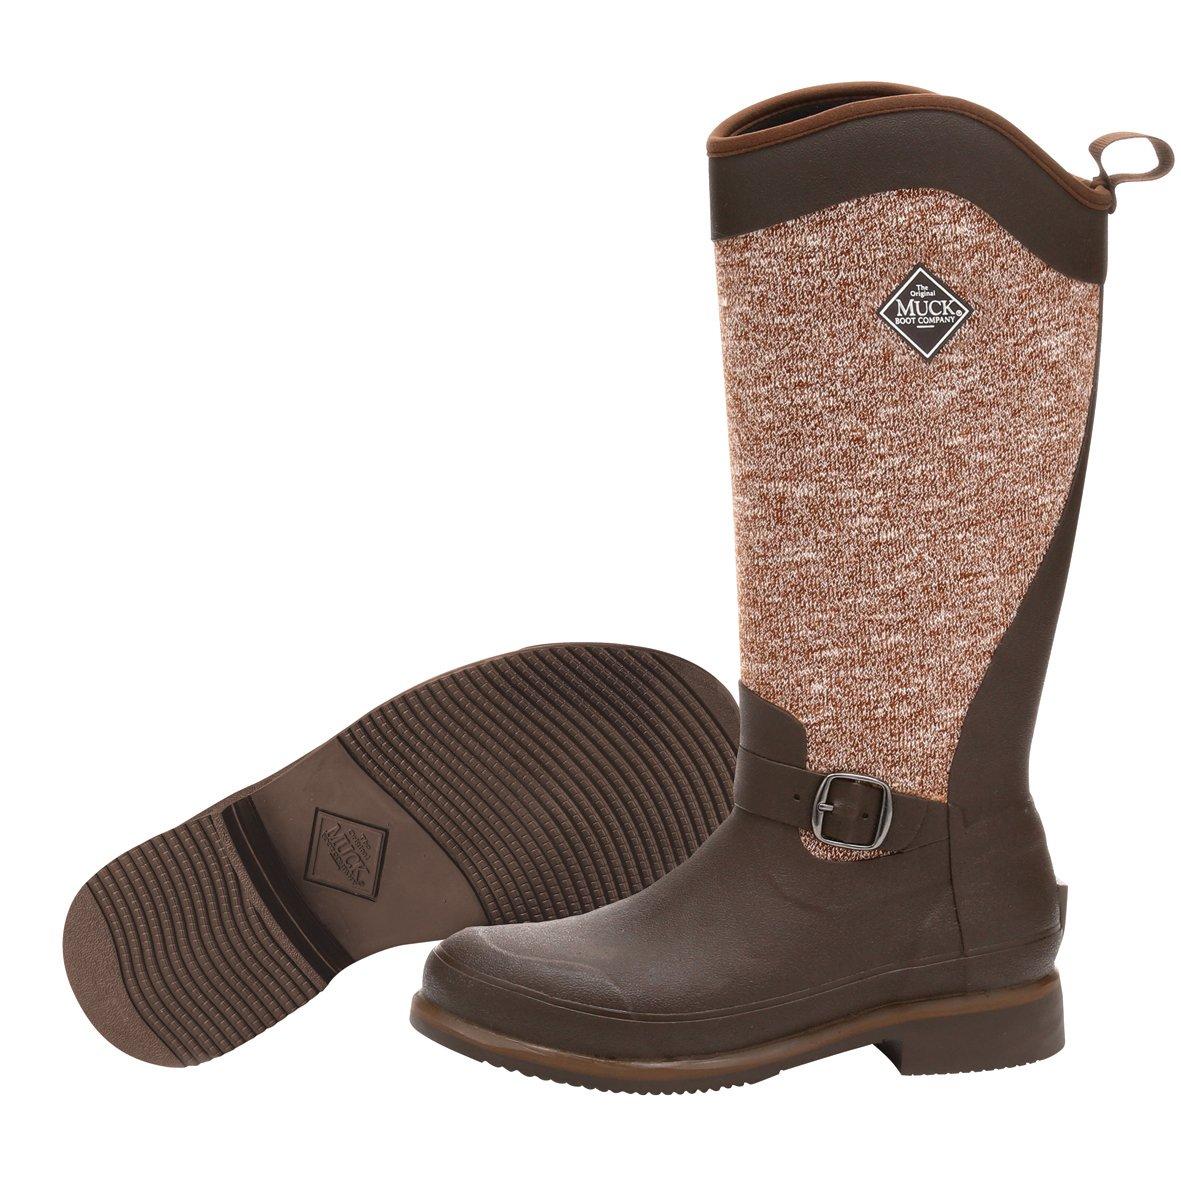 Muck Boot Women's Reign Supreme Snow B01K8FKHAY 9 B(M) US Brown/Bison